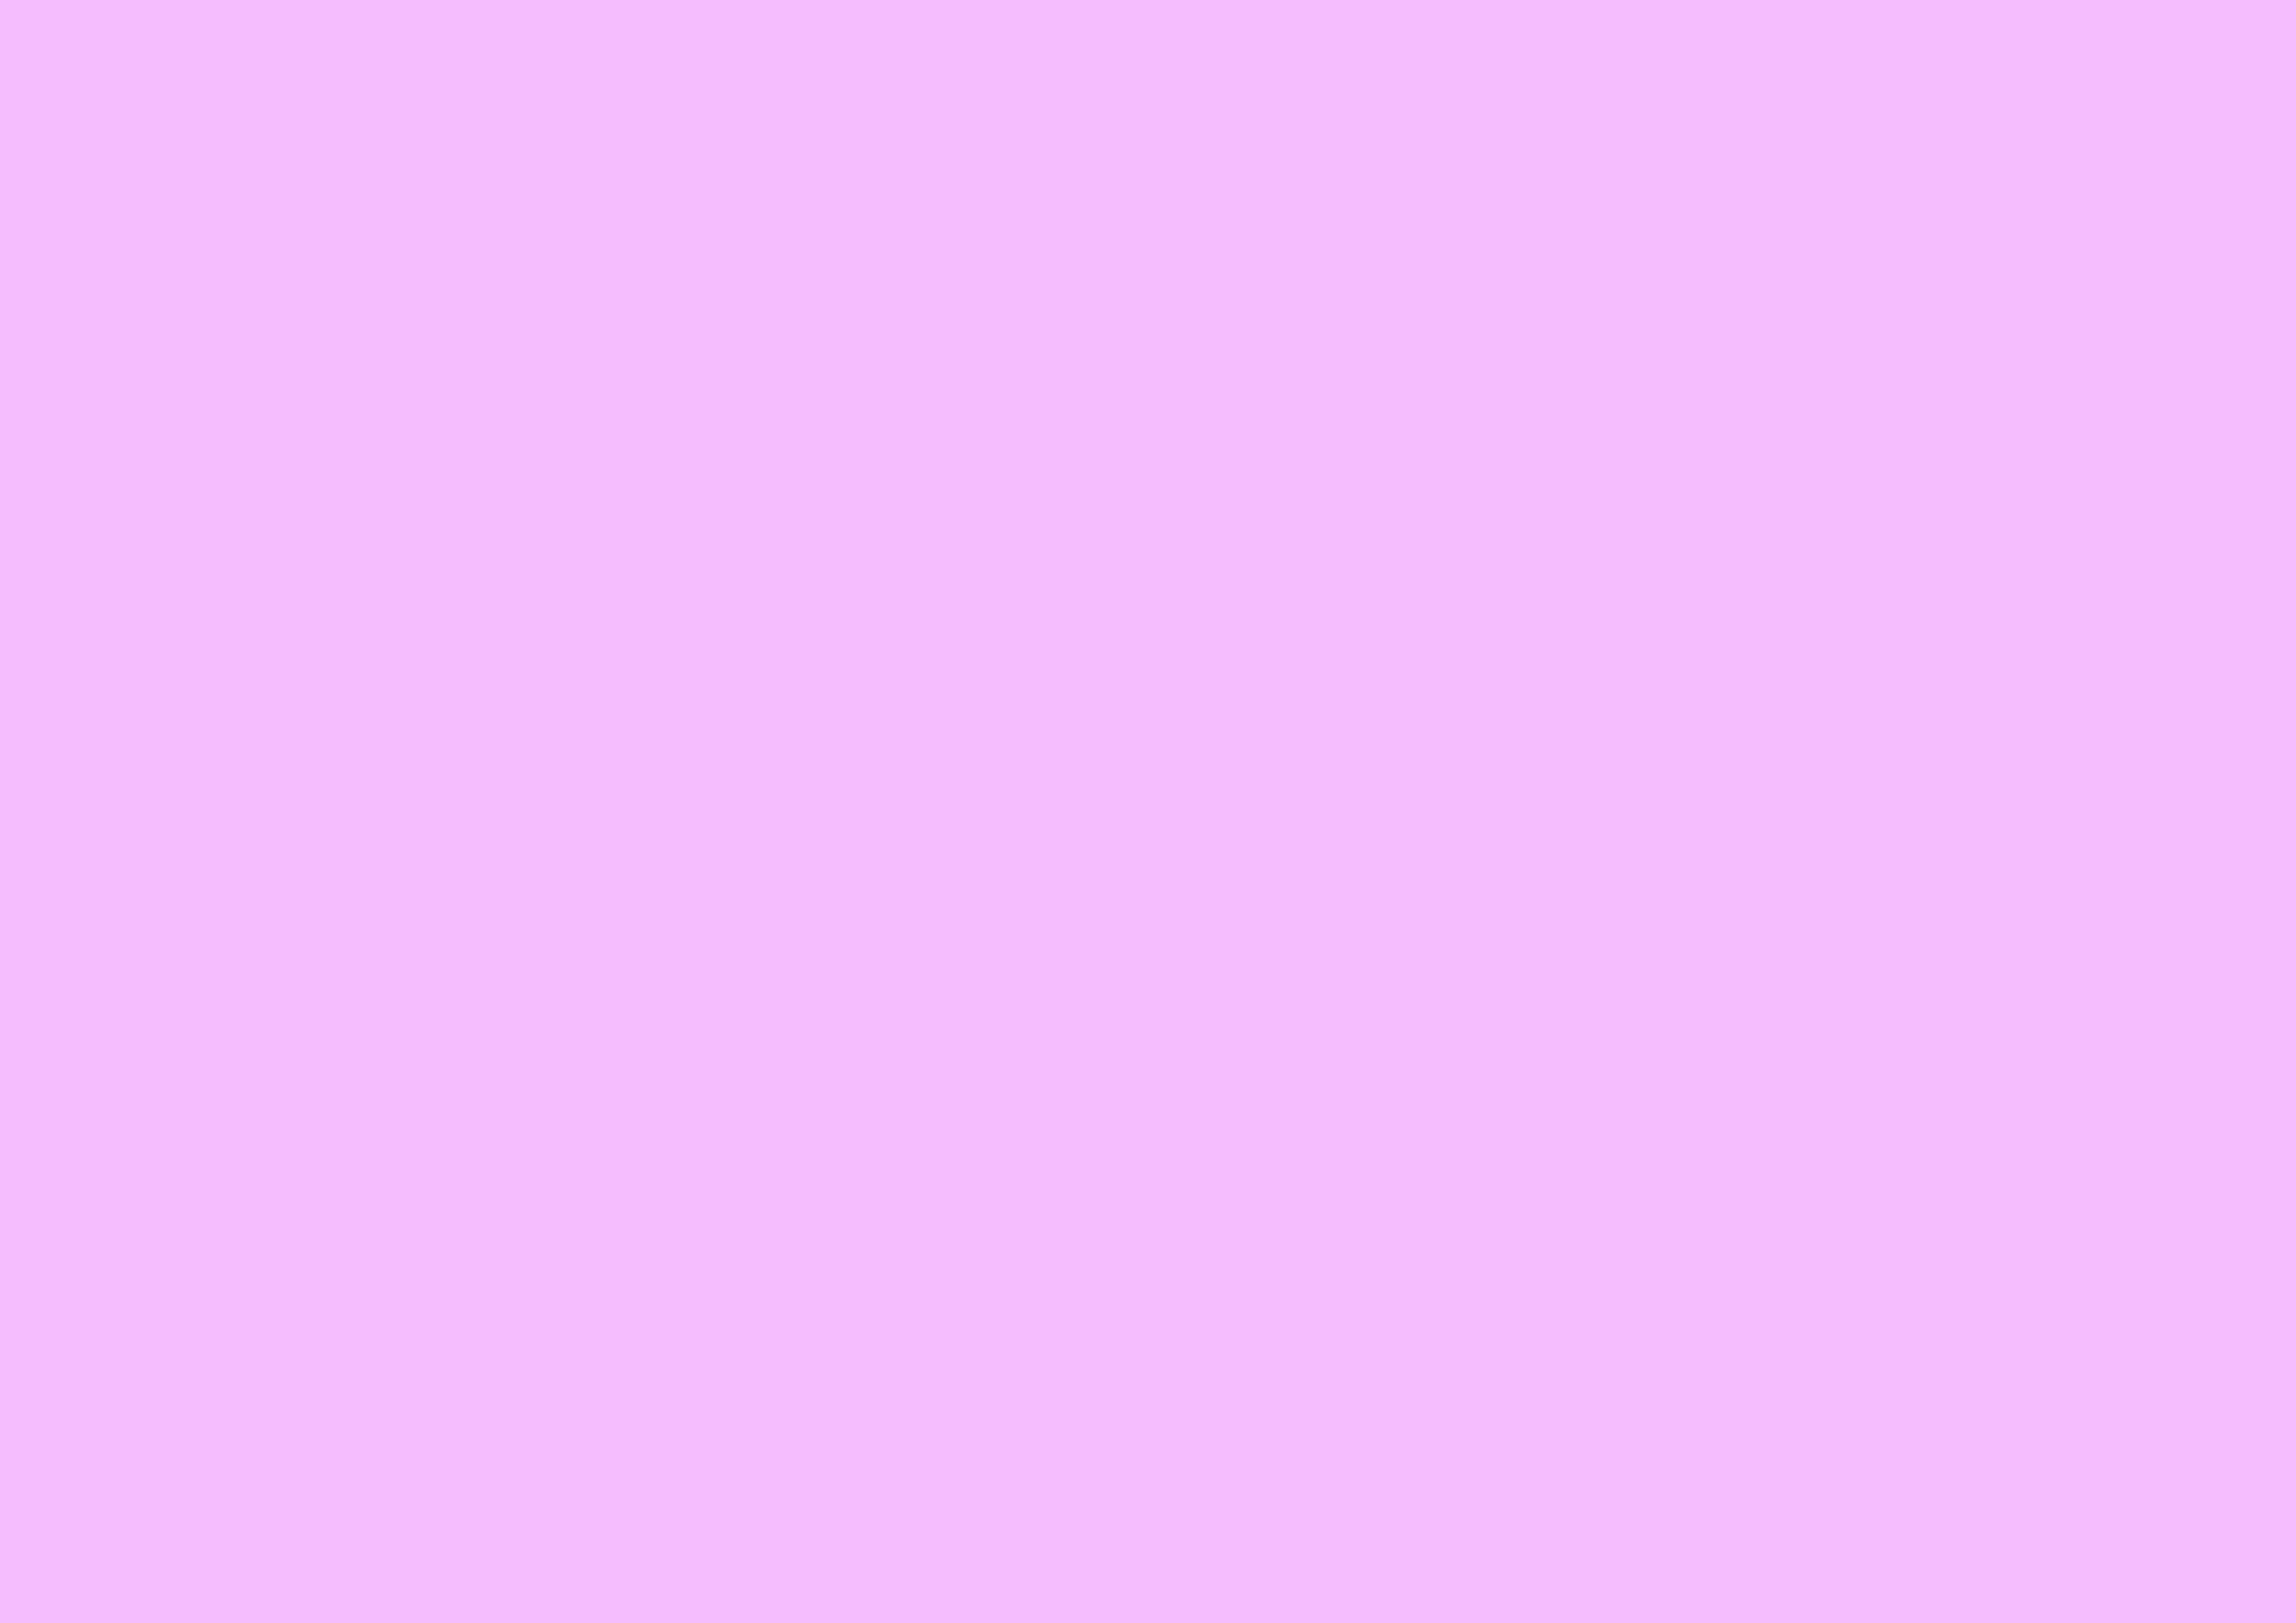 3508x2480 Brilliant Lavender Solid Color Background